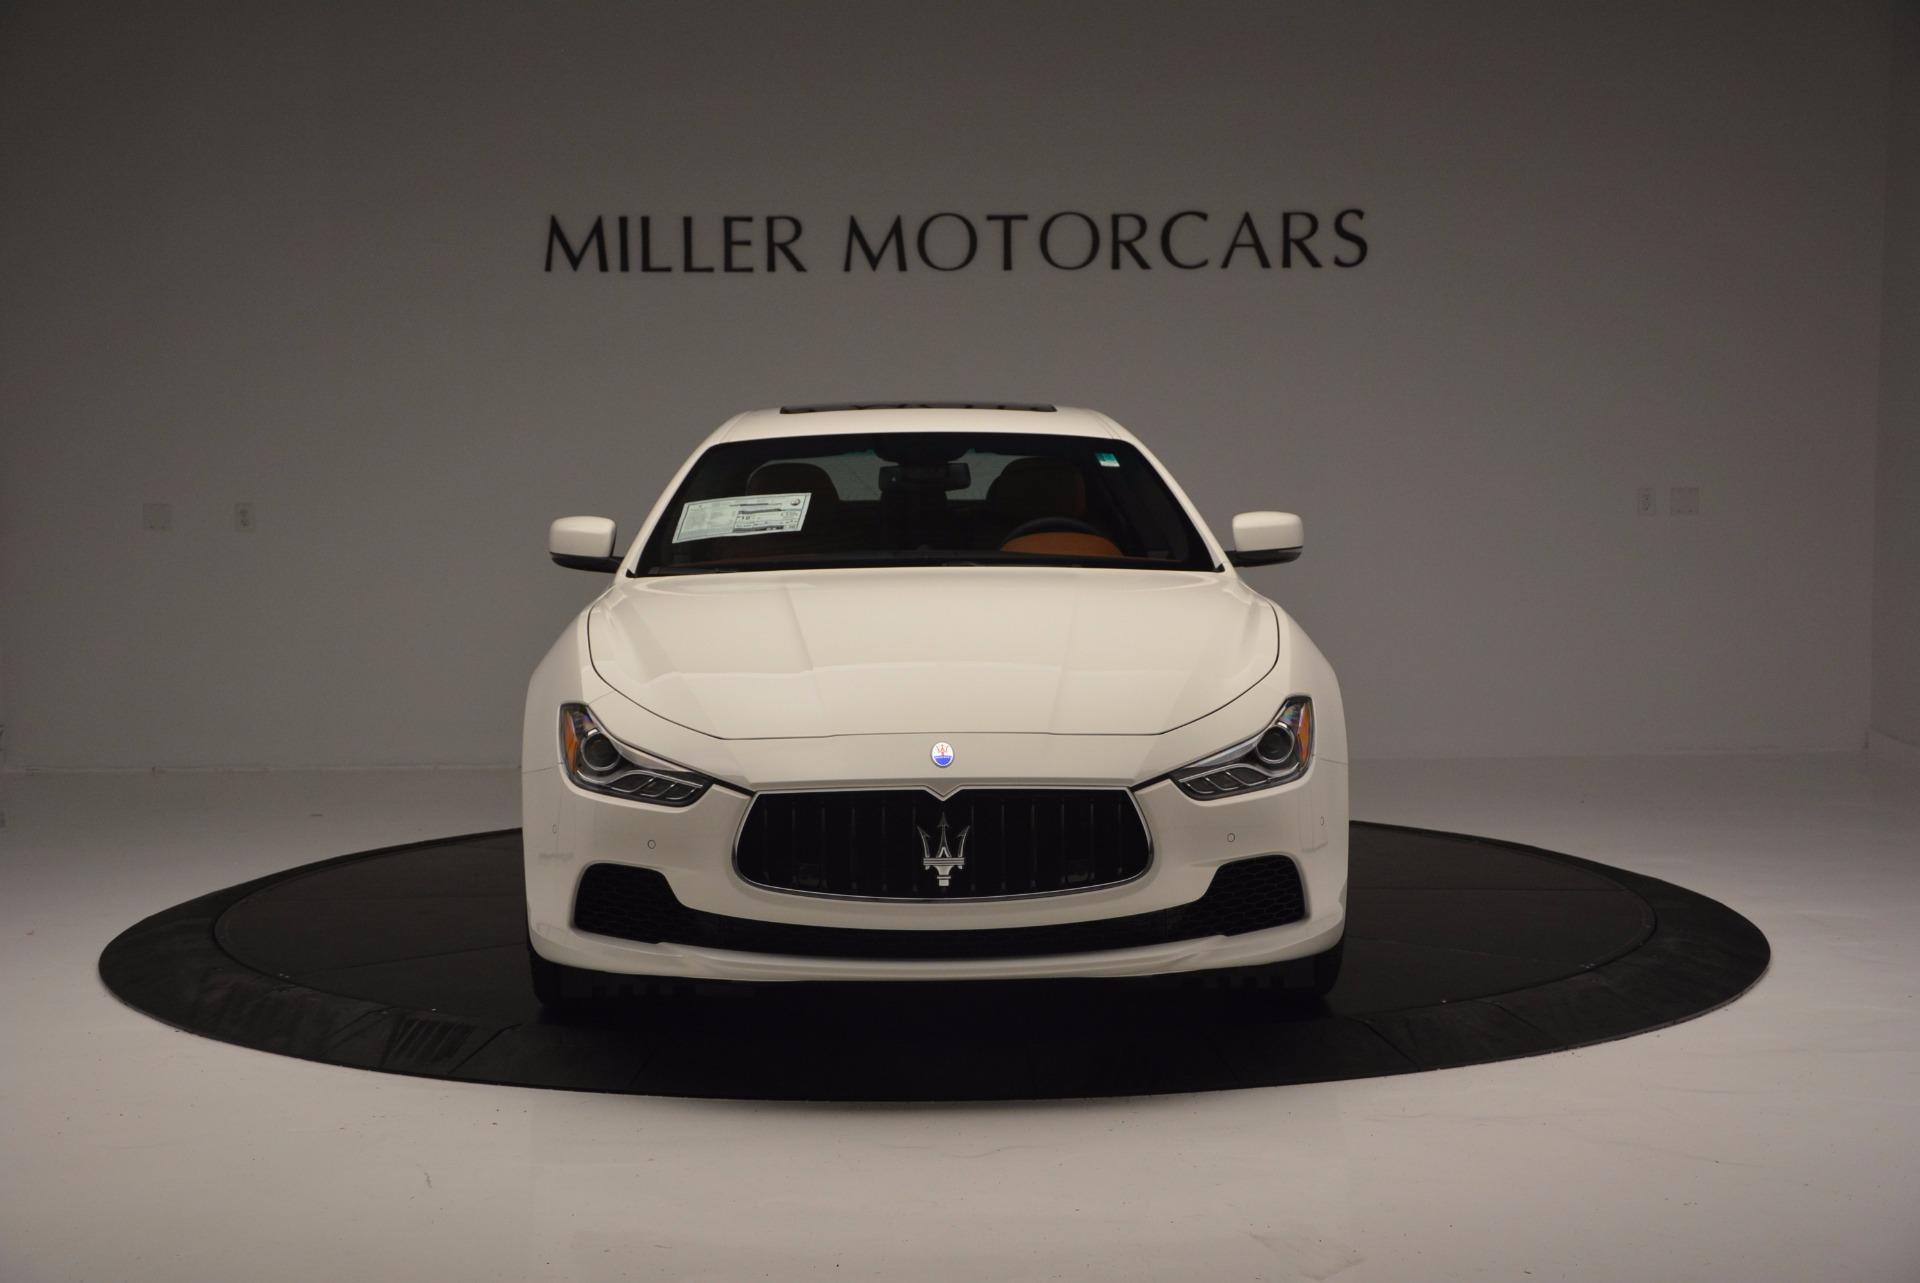 Used 2017 Maserati Ghibli S Q4 Ex-Loaner For Sale In Greenwich, CT 1166_p12